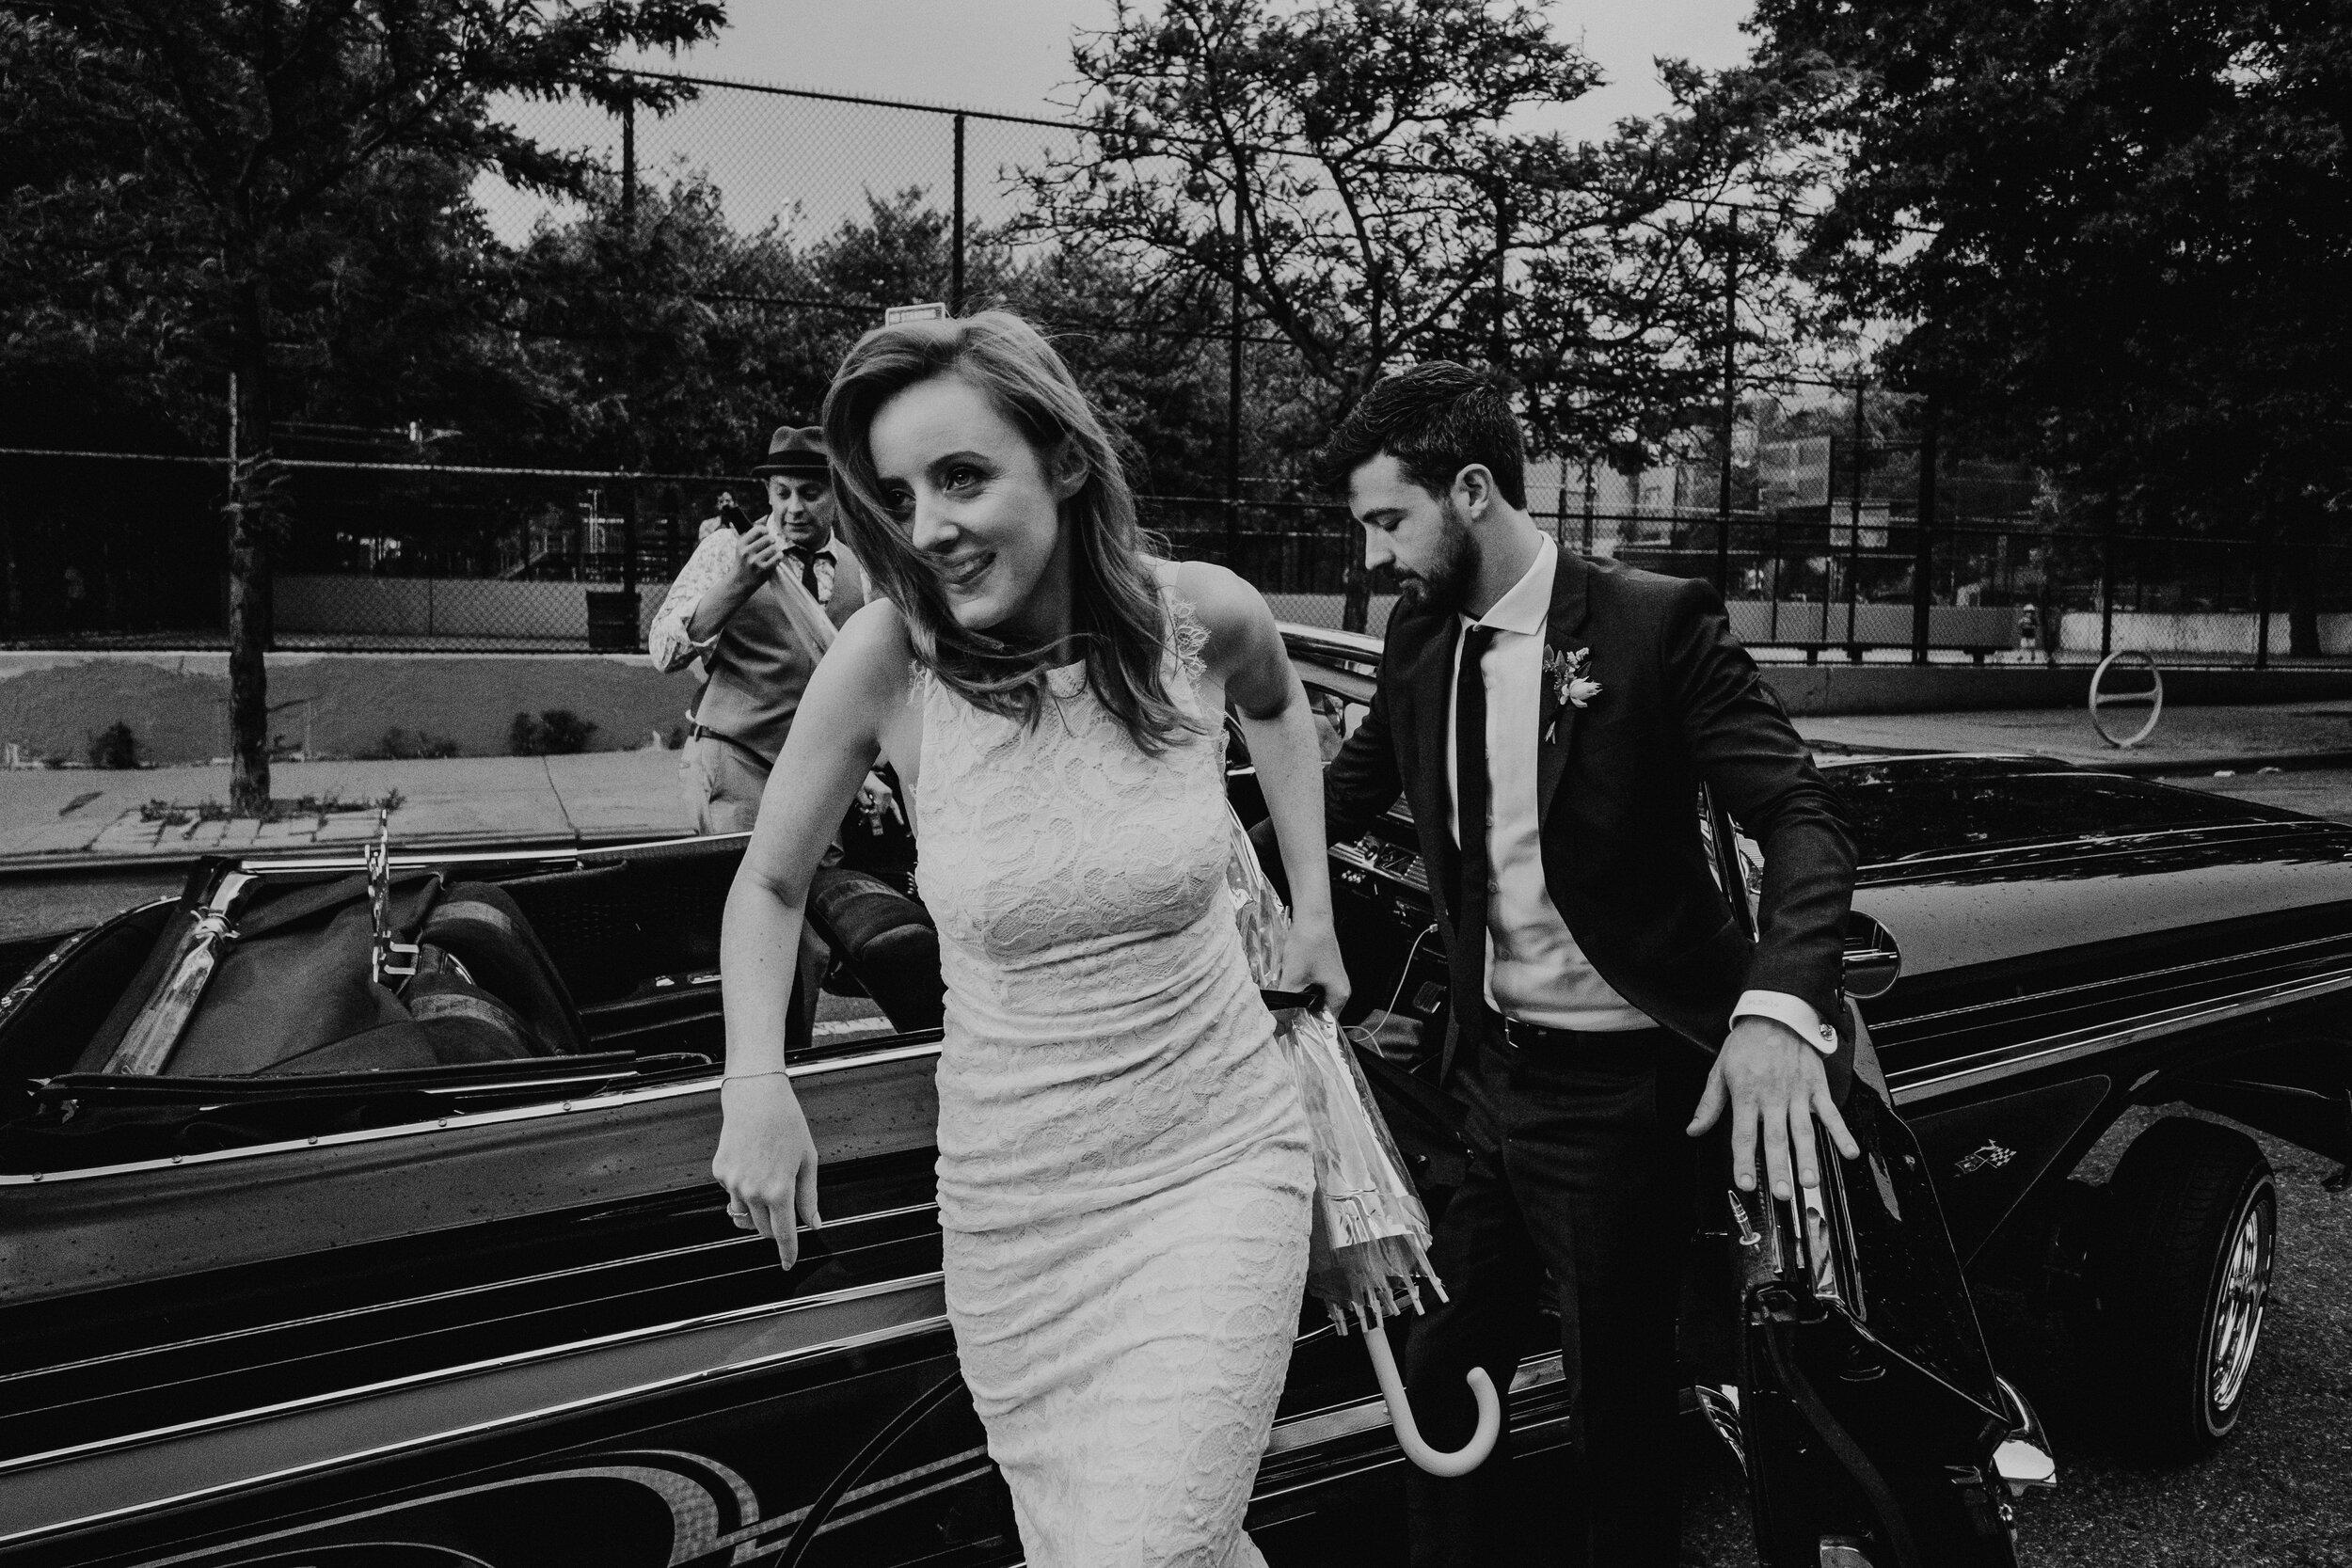 Aurora_Brooklyn_Wedding_Photographer_Chellise_Michael_Photography-236.jpg